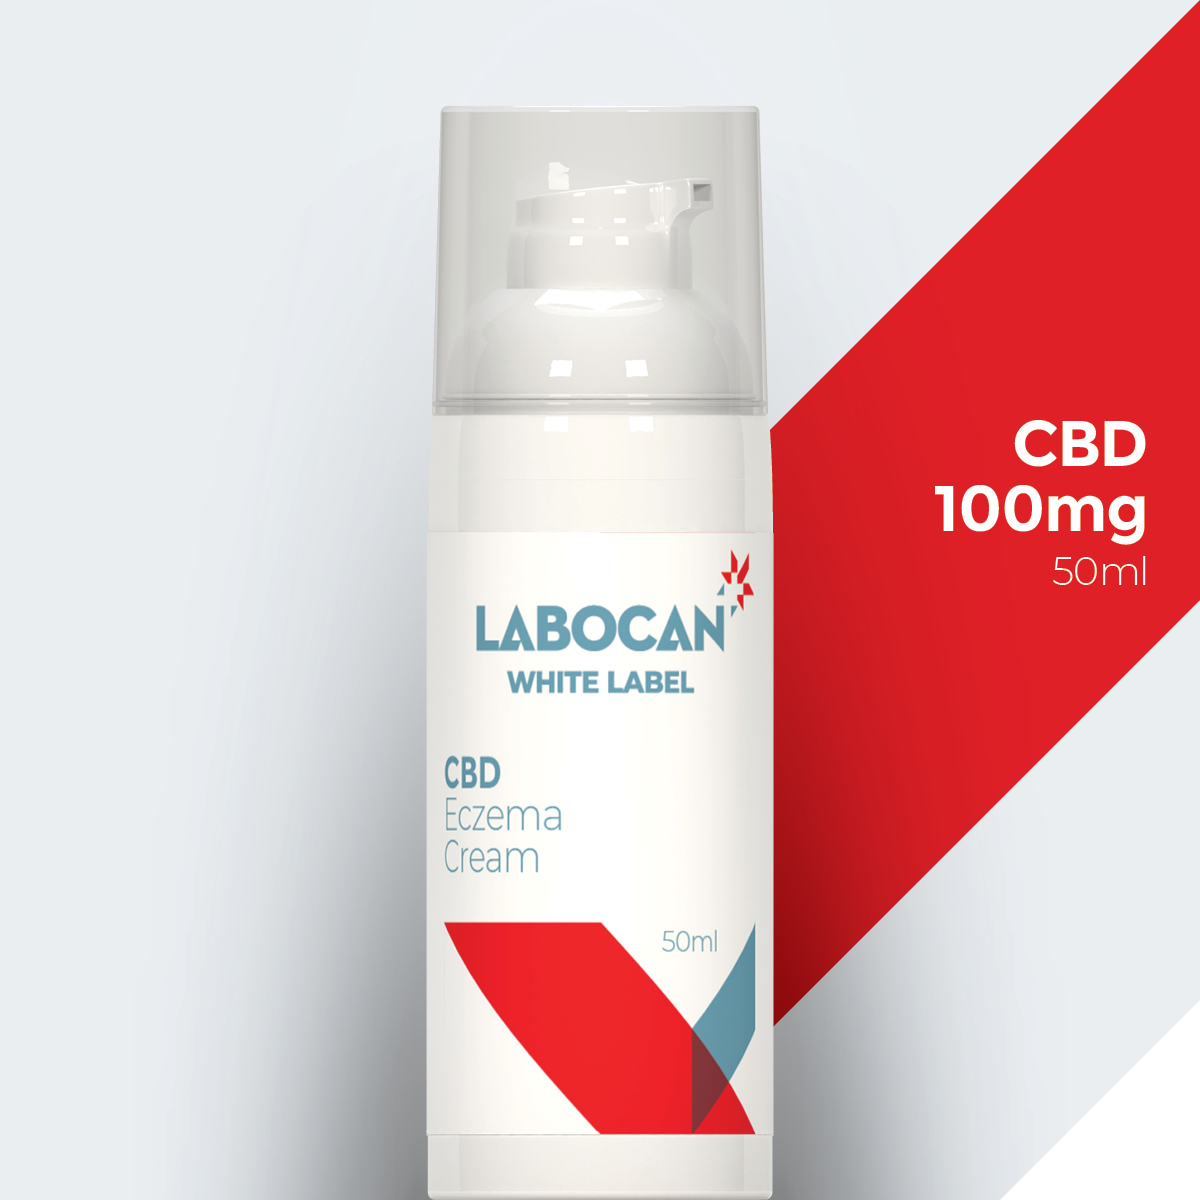 Labocan Crema per eczema al CBD etichetta bianca